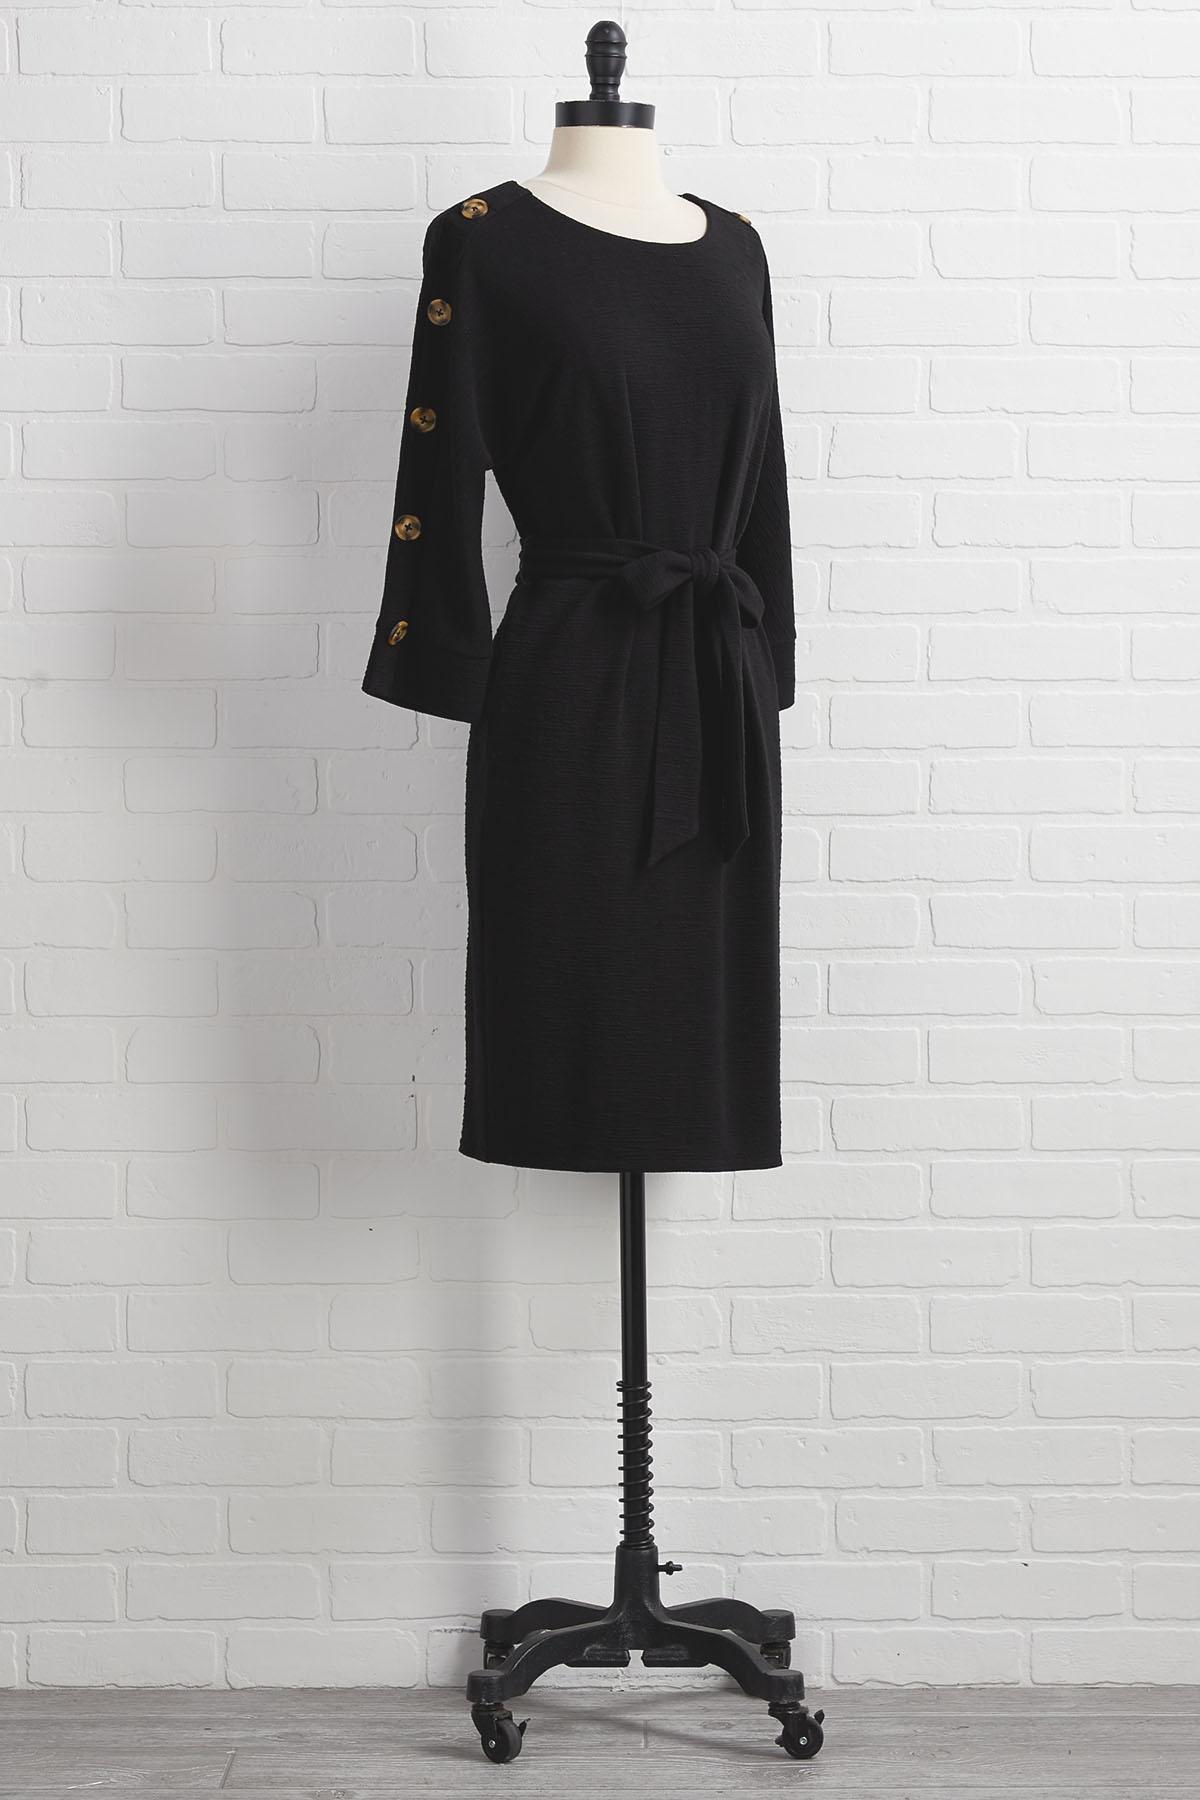 Heart And Coal Dress